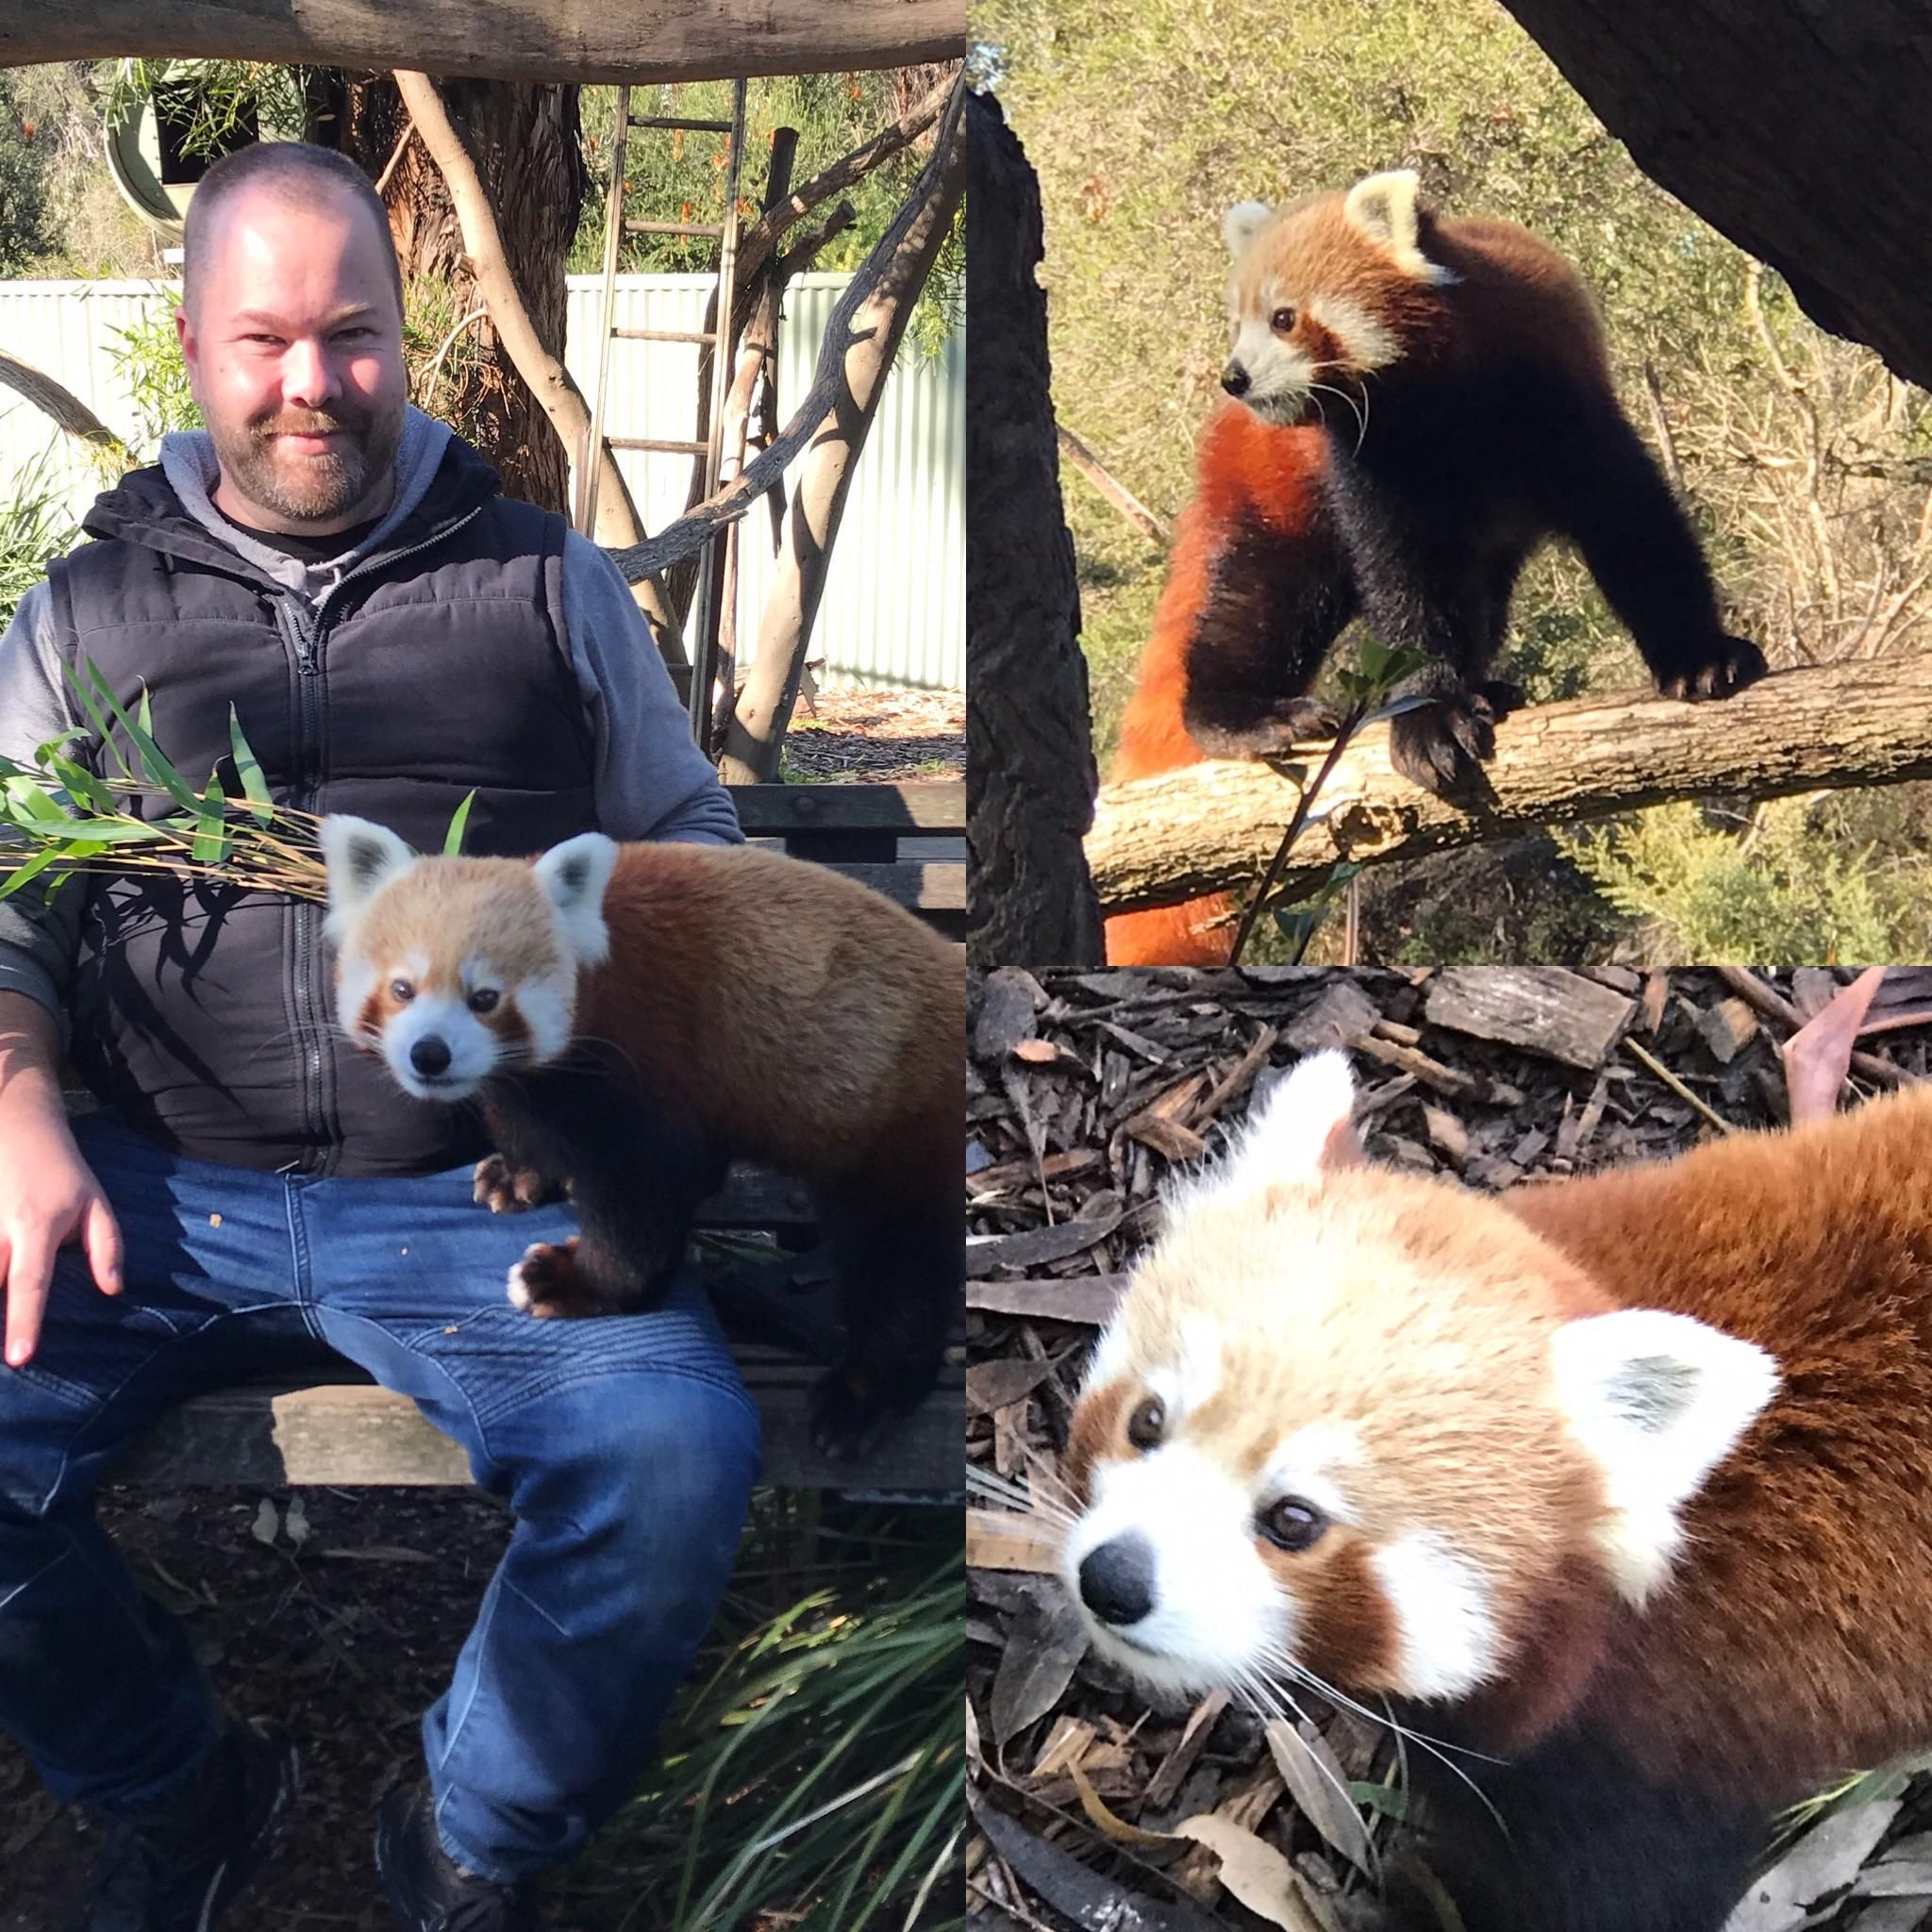 Please Follow Iloveredpandas Got To Do An Encounter With Shardul The Red Panda At Halls Gap Zoo Today For My Birthday Redpan Red Panda Panda Bear Cute Bears